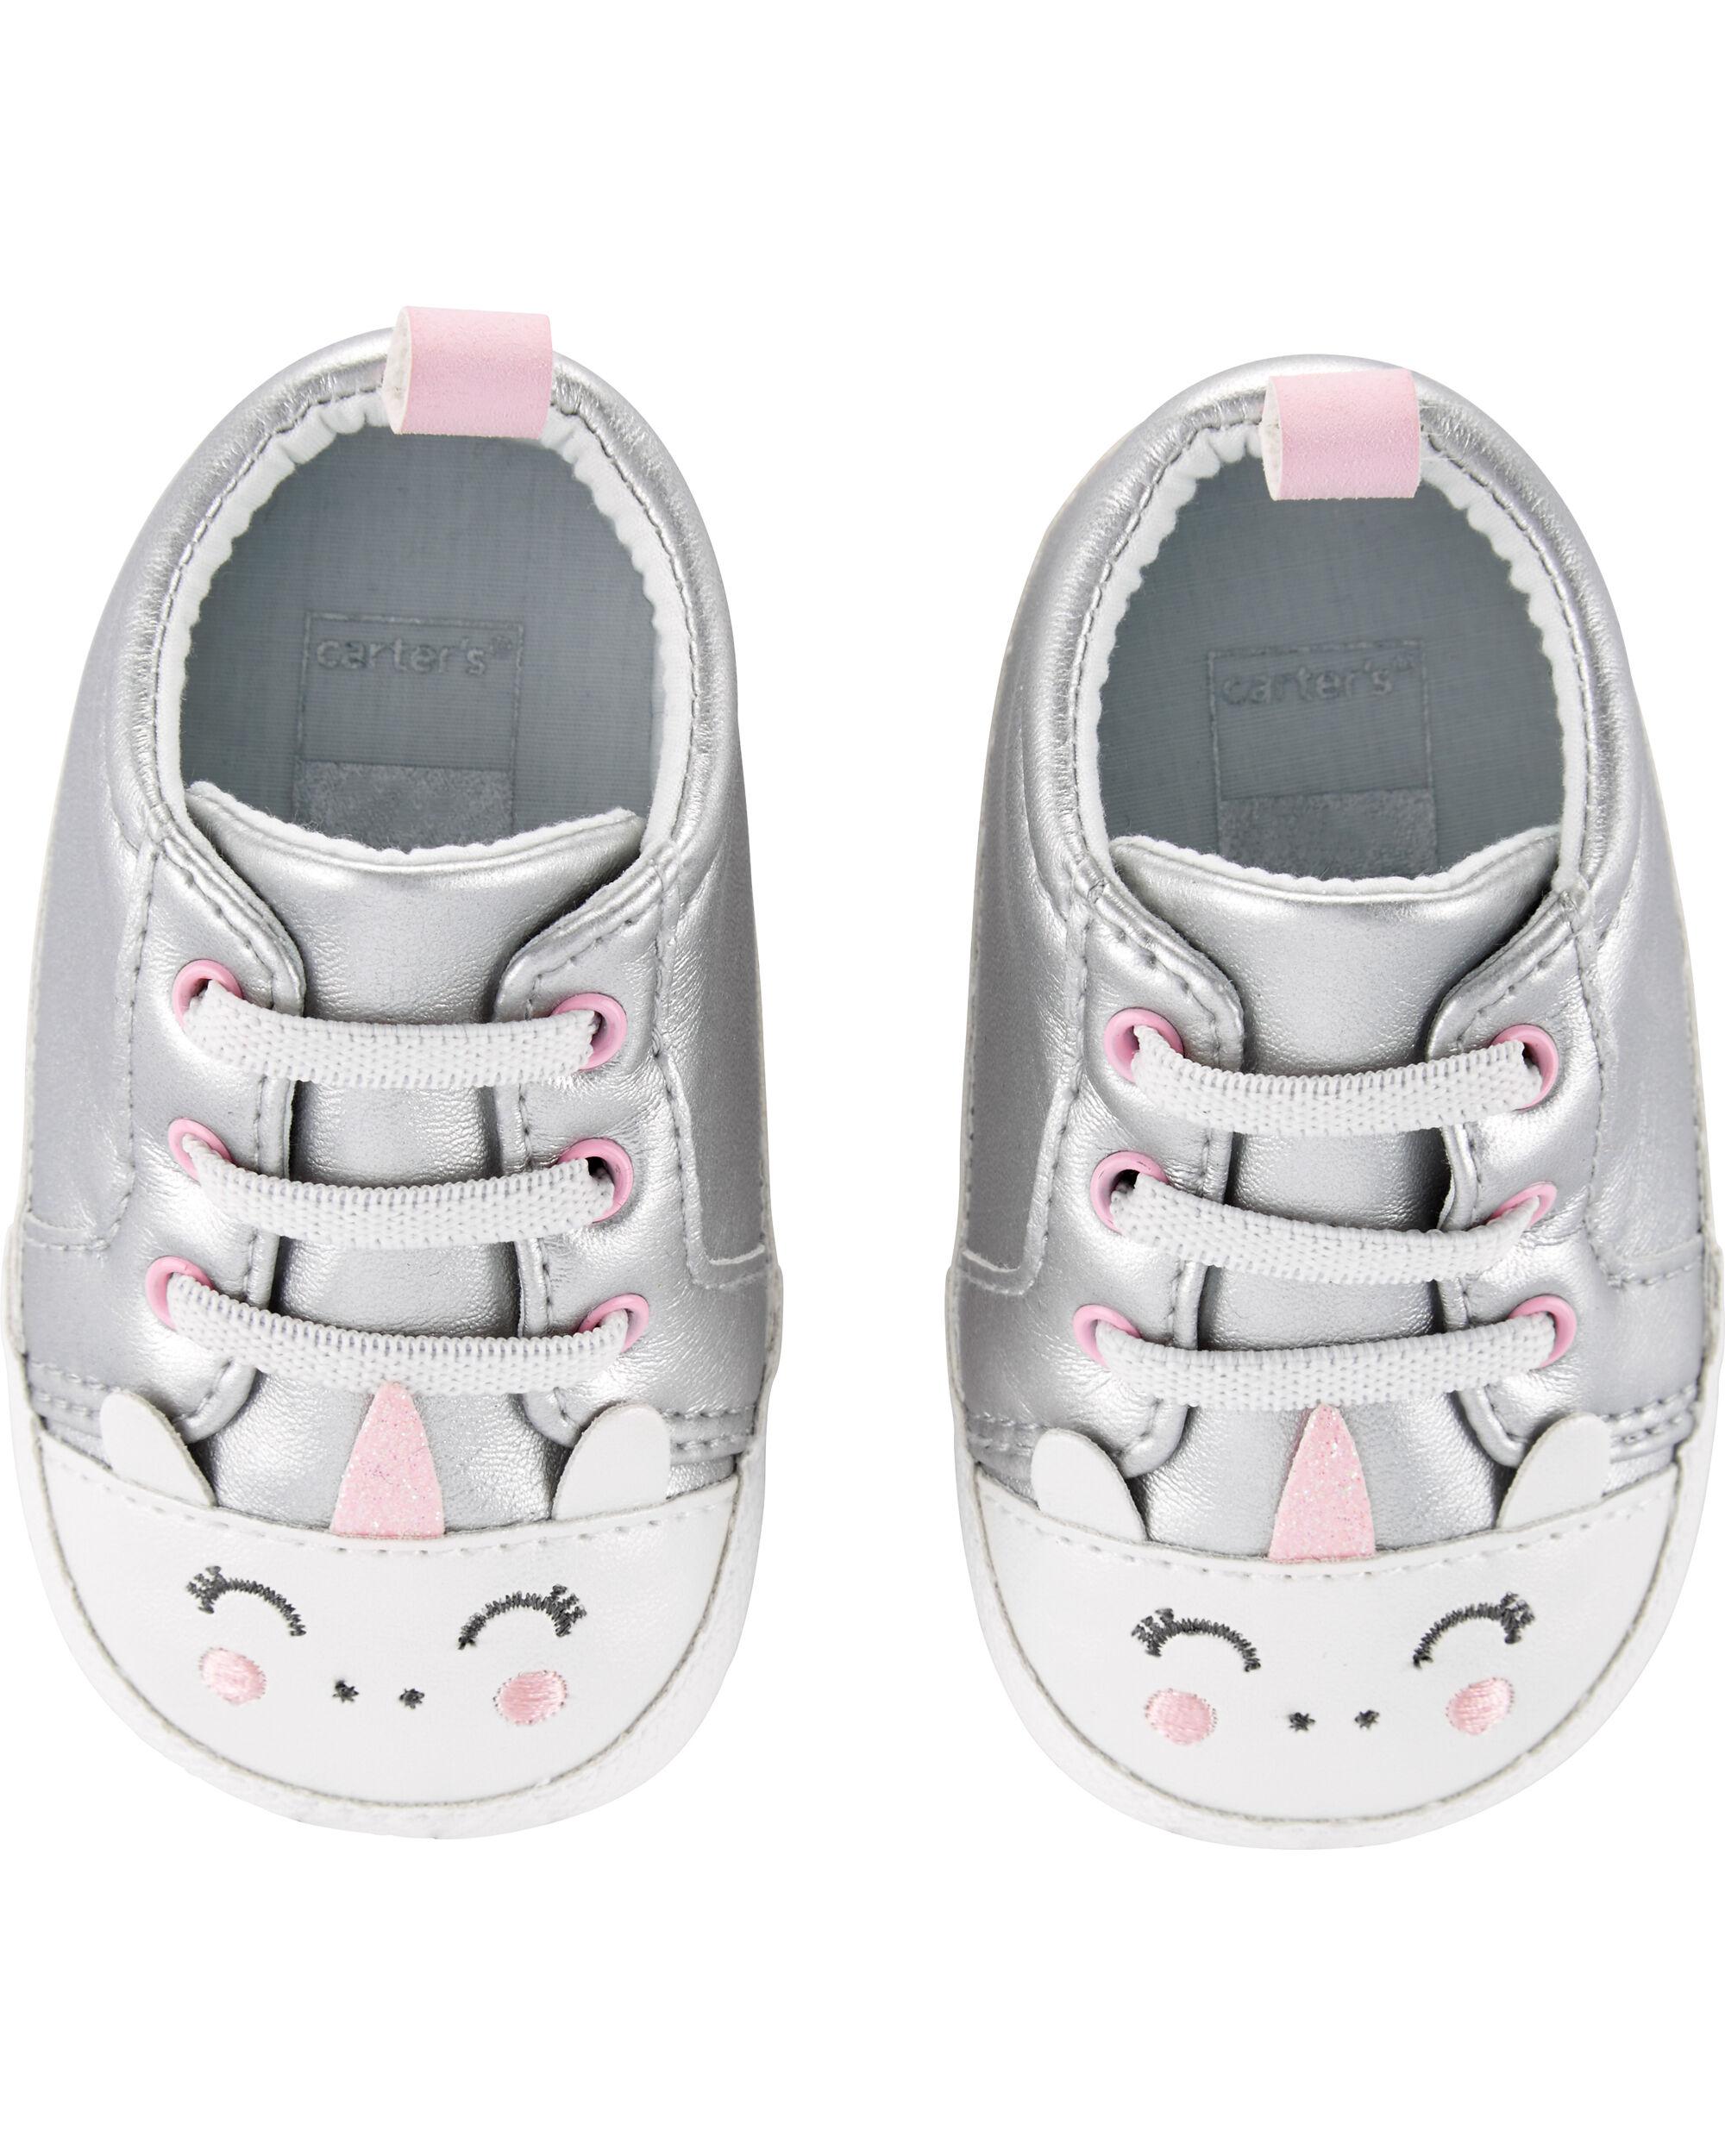 Carter's Unicorn Baby Shoes | carters.com